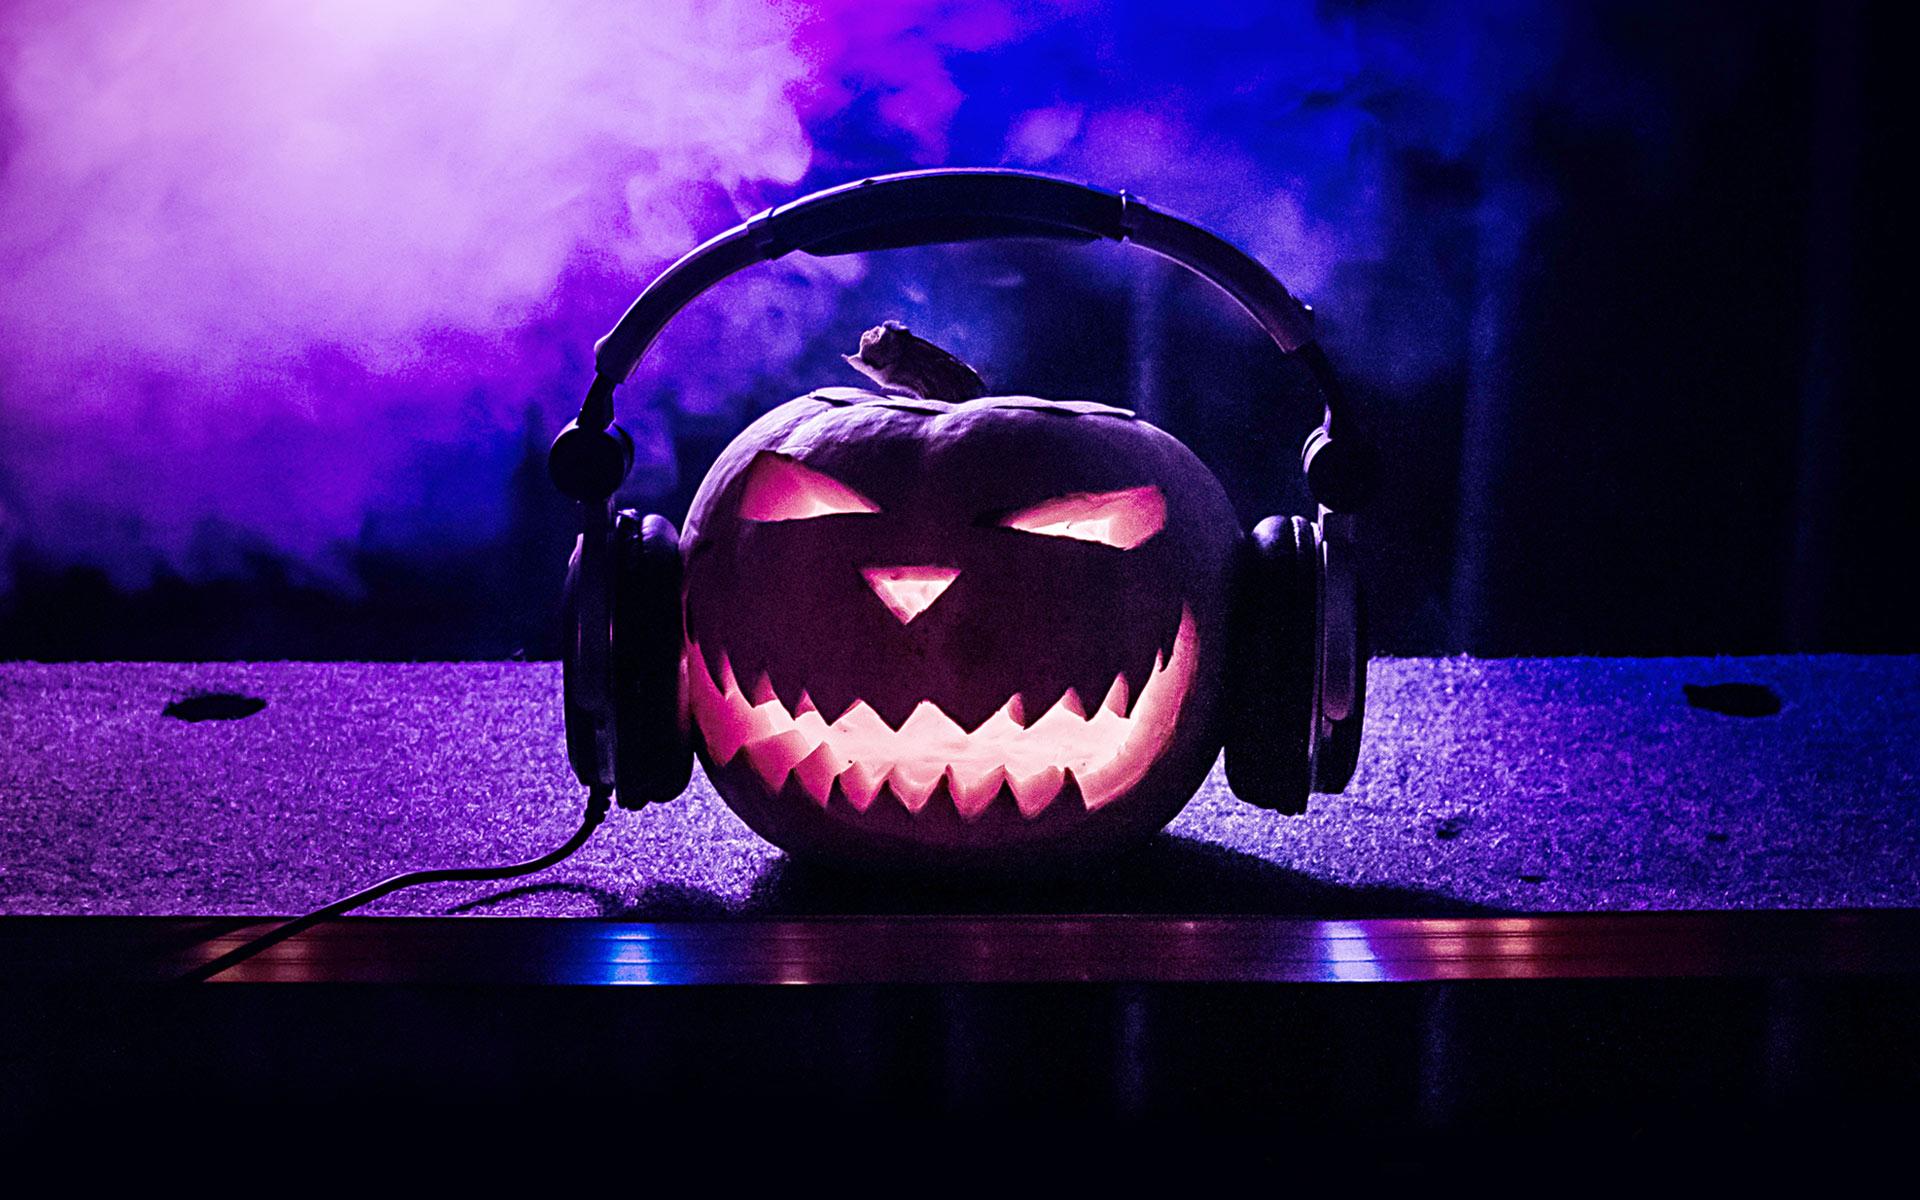 An illuminated jack o' lantern wearing headphones sitting on top of a soundboard surrounded by purple smoke.